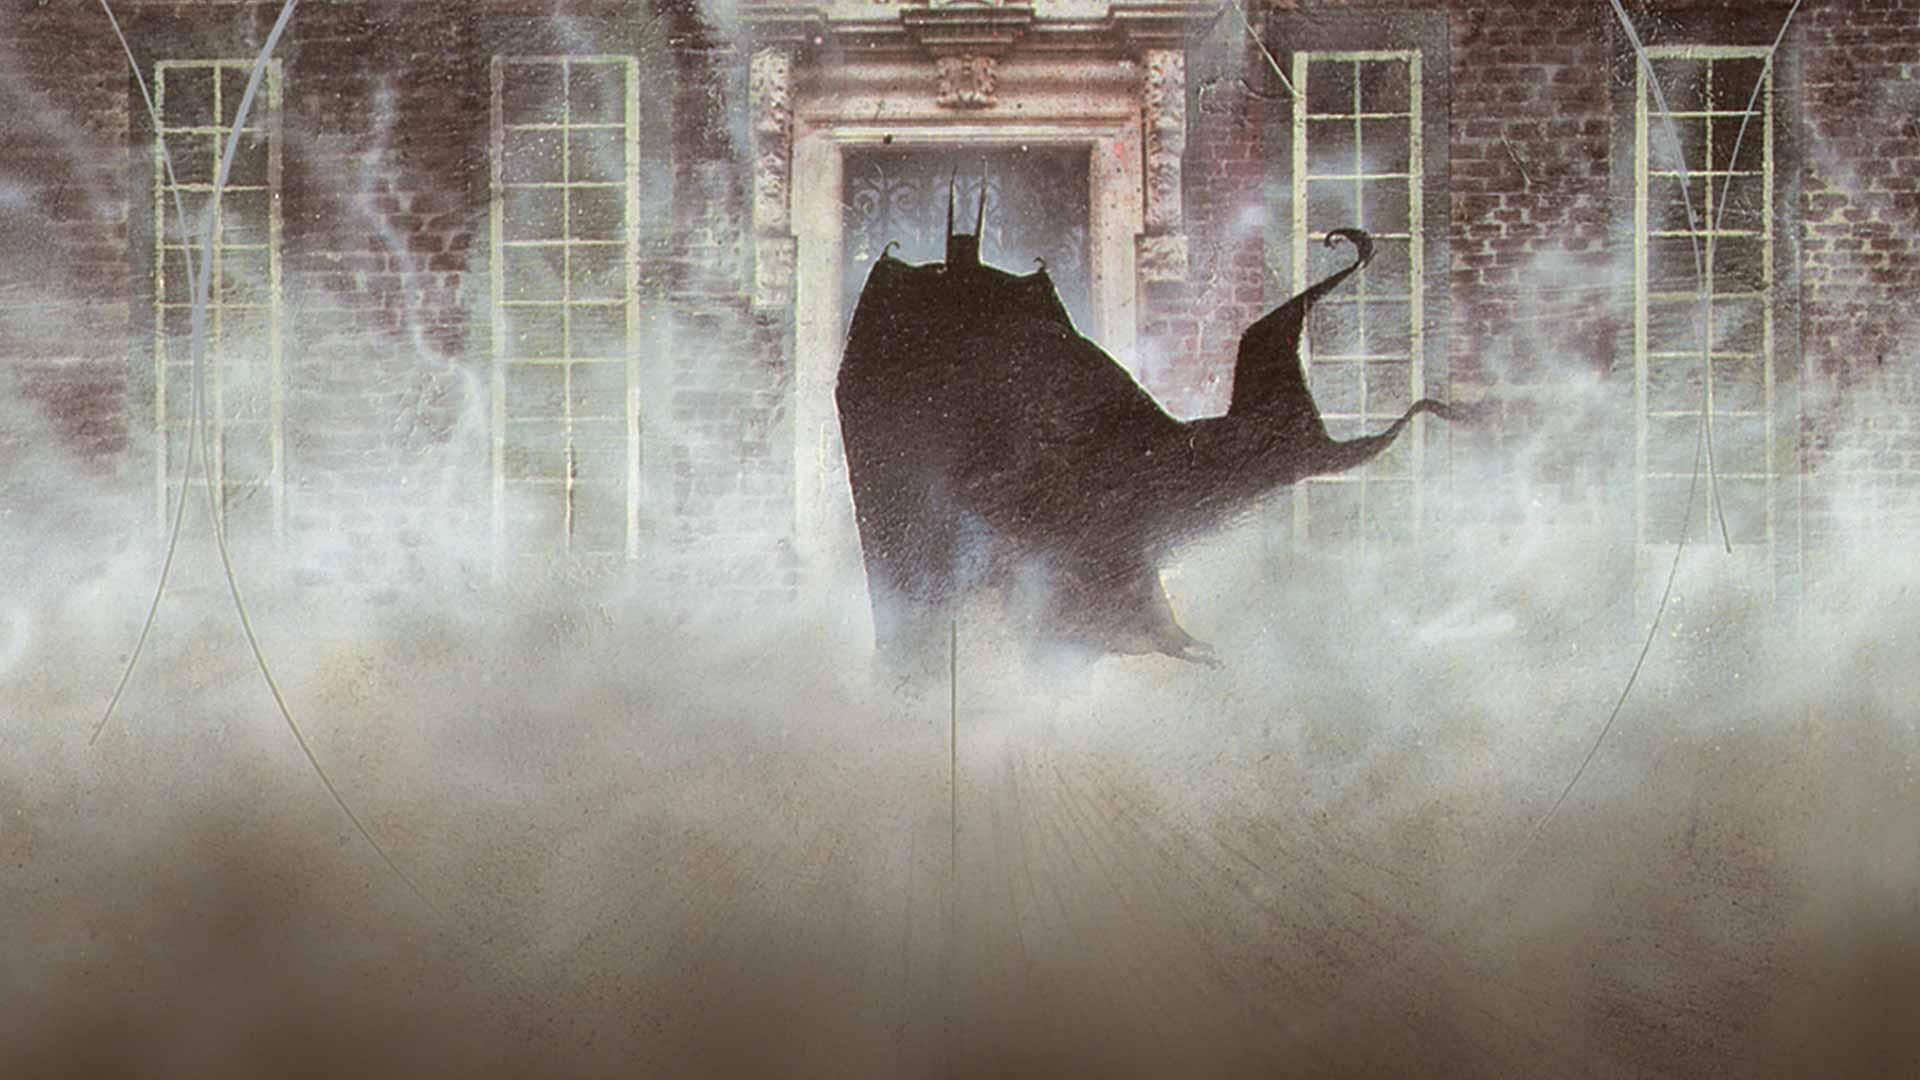 SDCC 2017 Grant Morrison Arkham Asylum 2